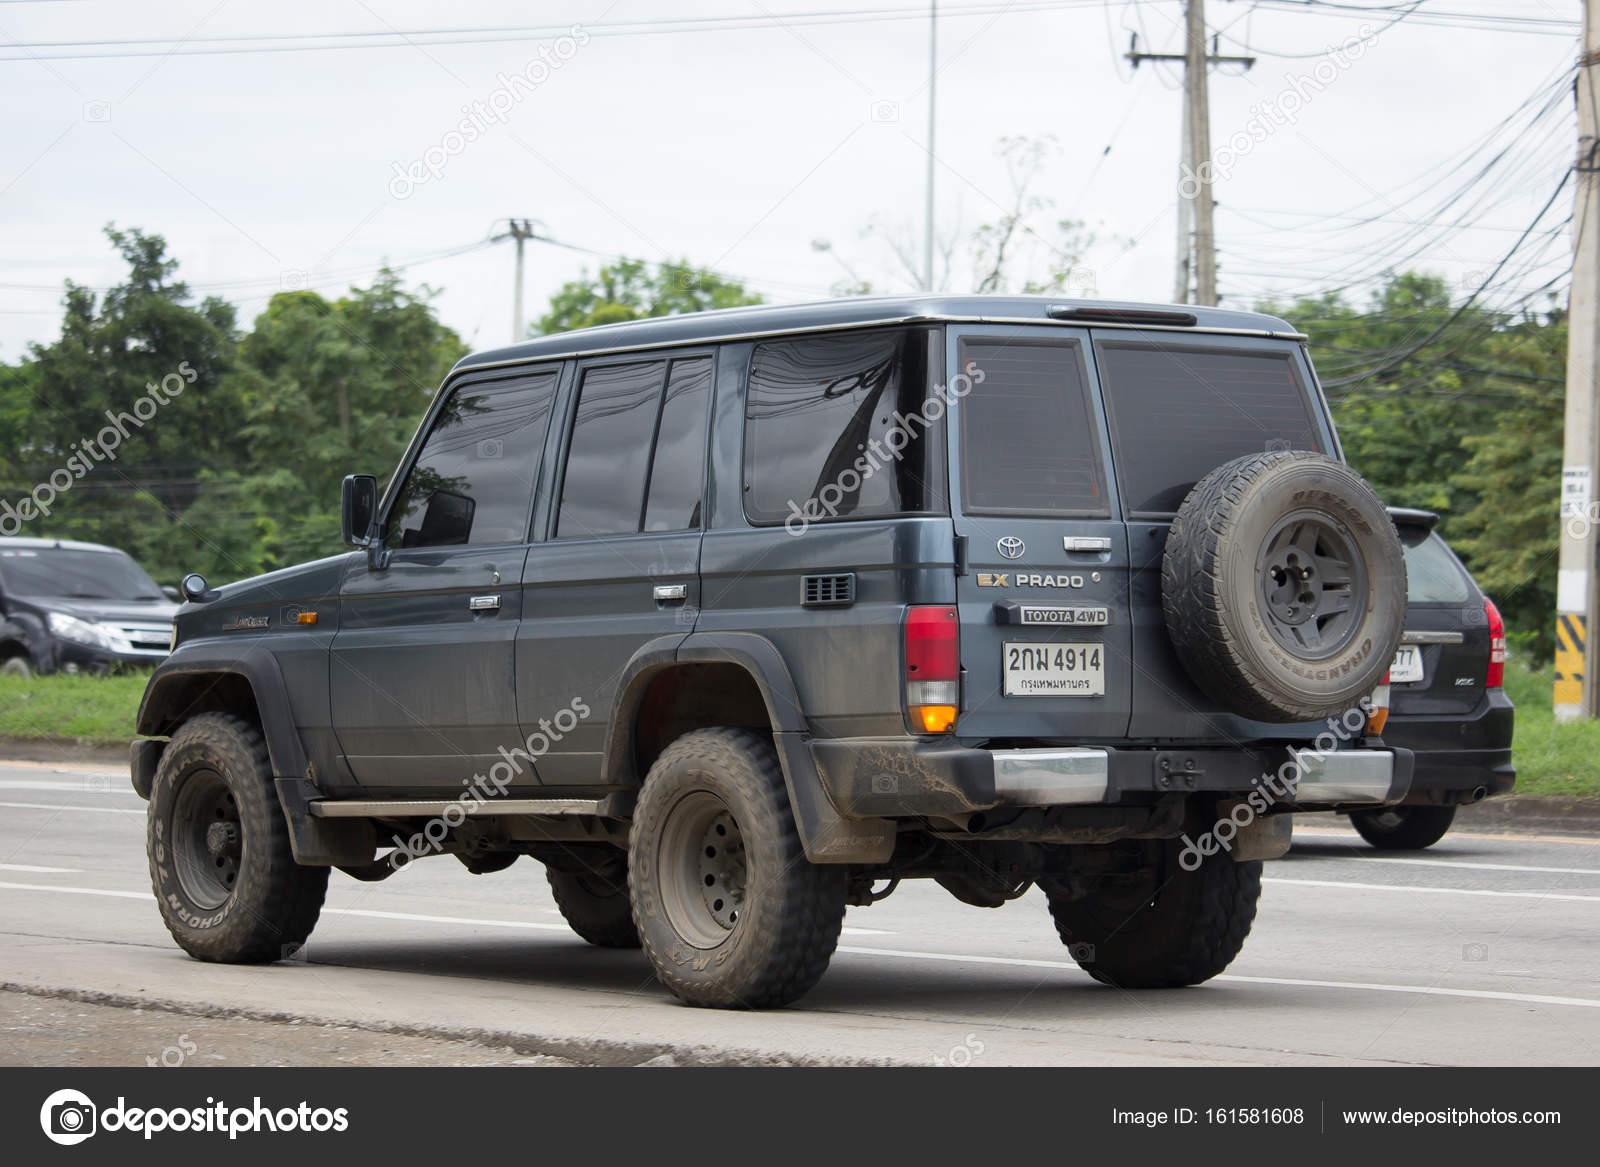 Toyota Landcruiser 300 >> Private suv car, Toyota Prado – Stock Editorial Photo © nitinut380 #161581608